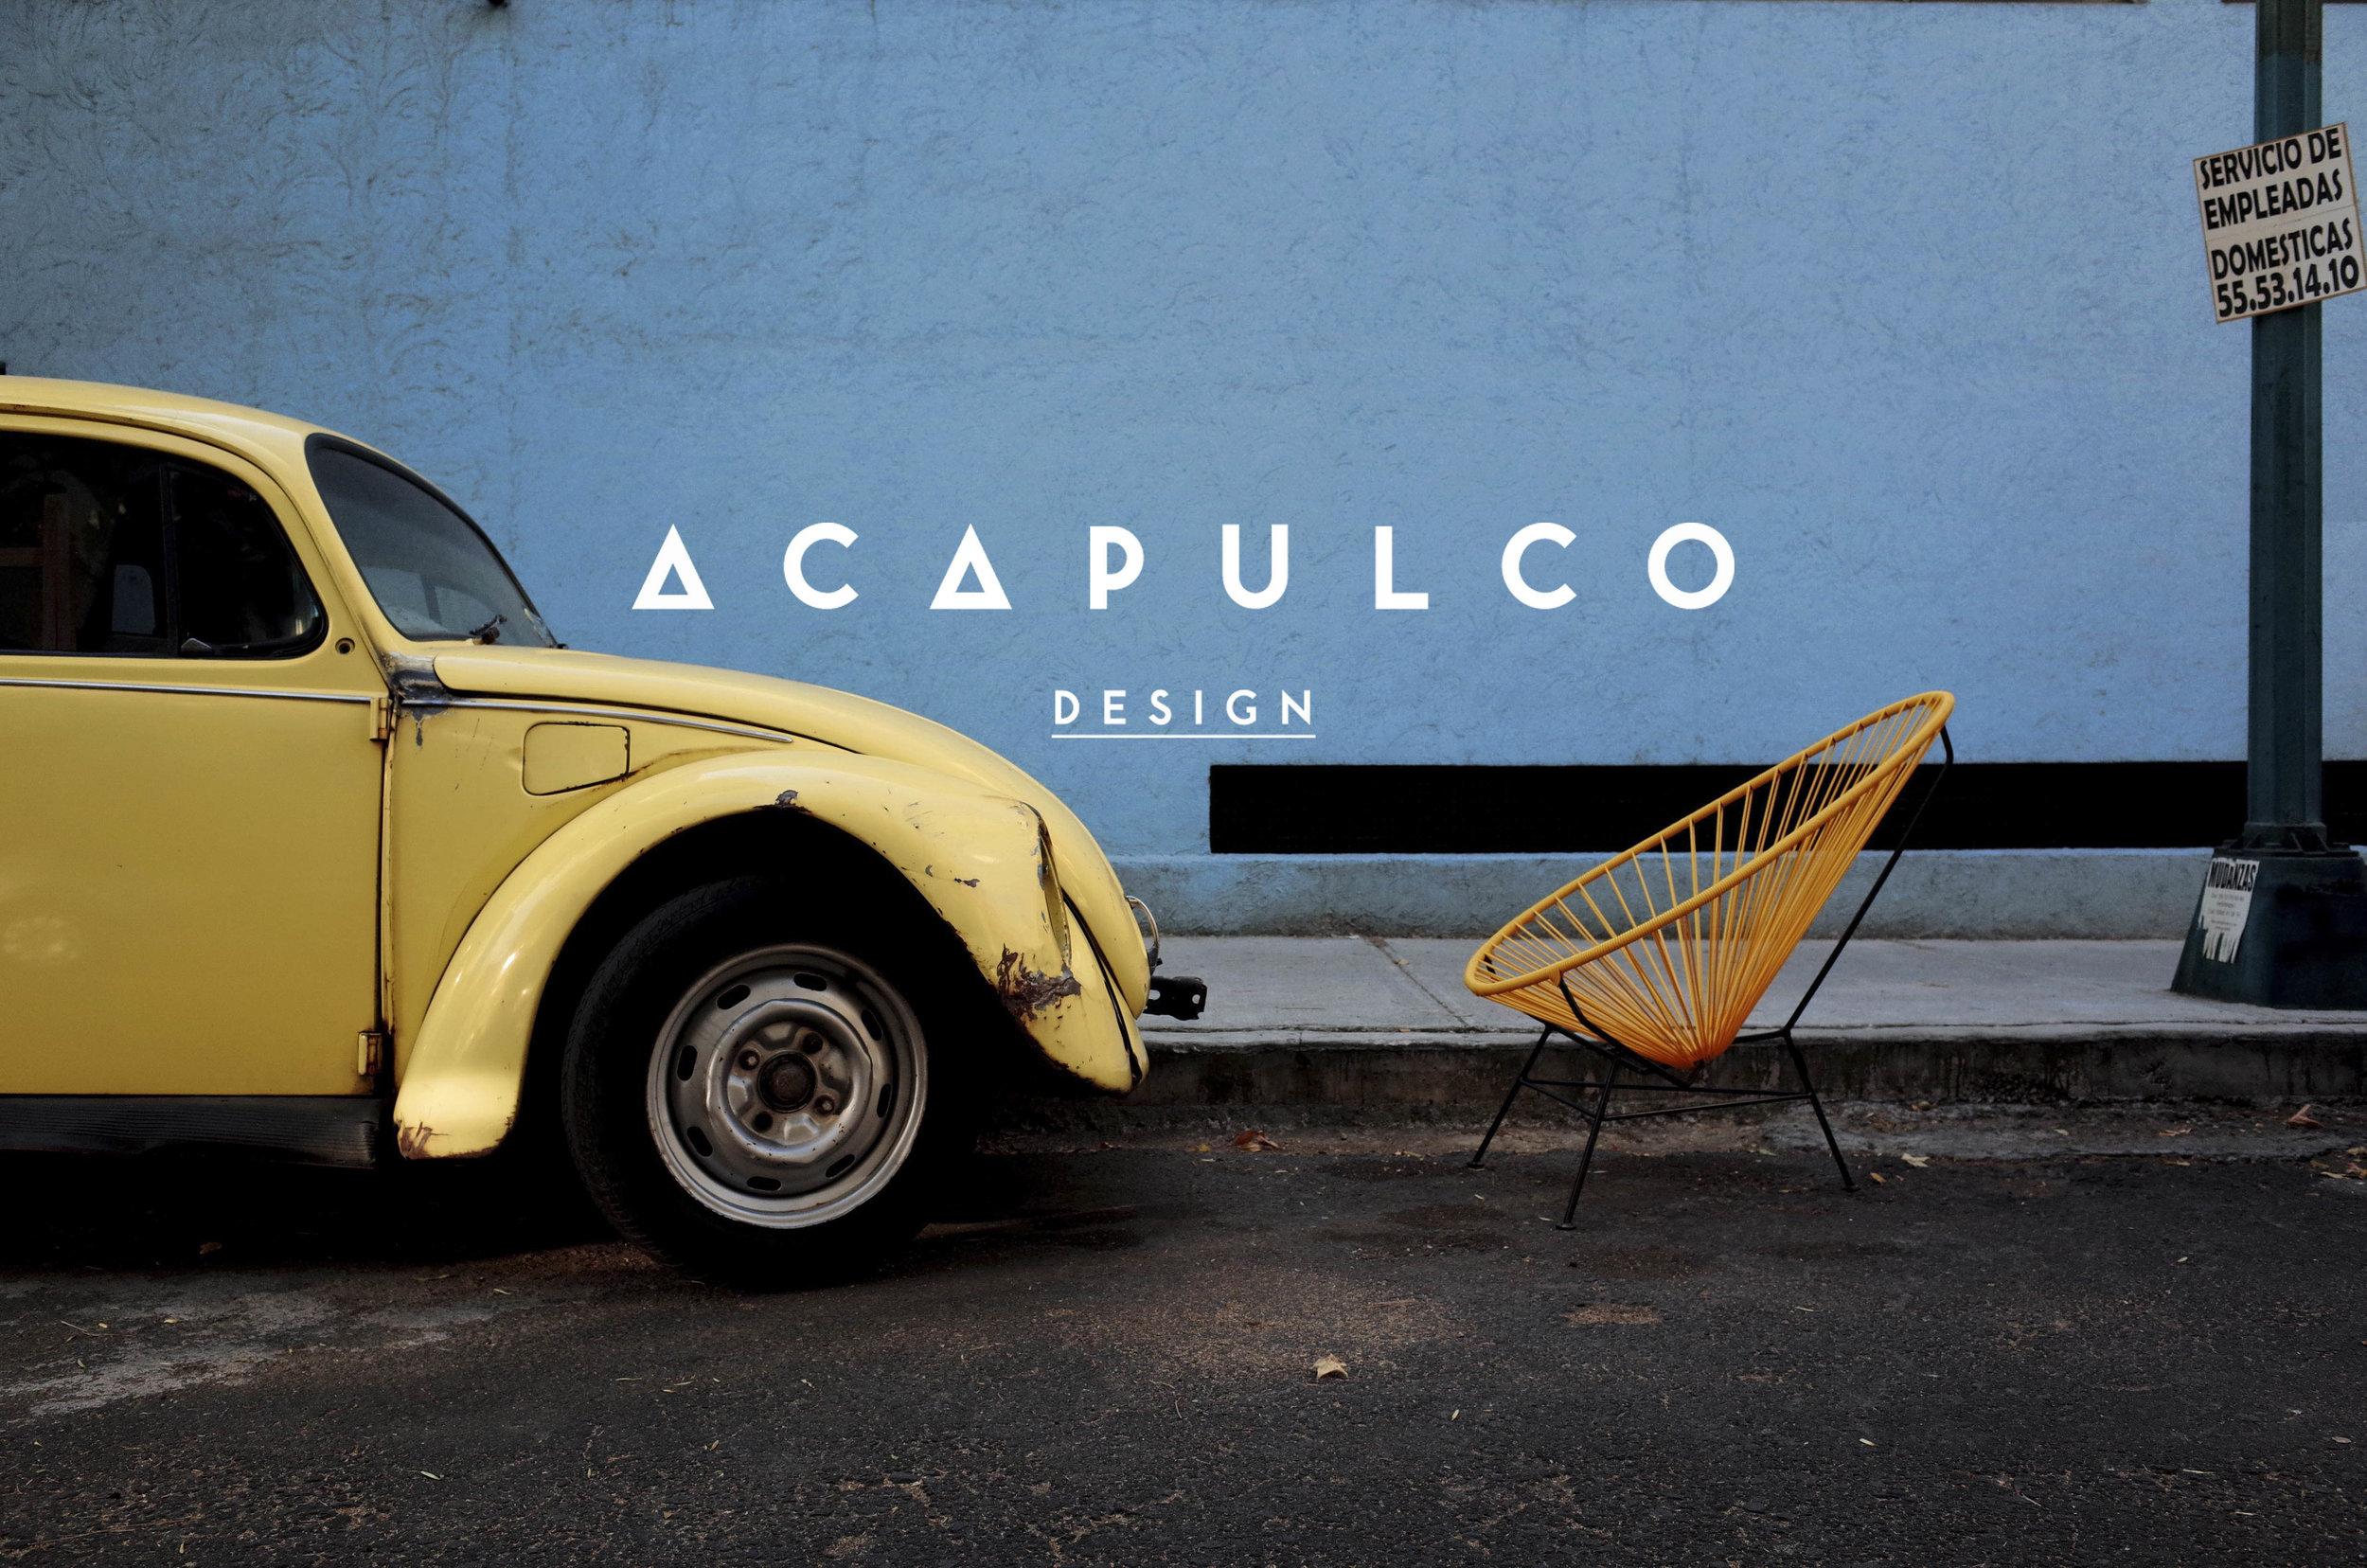 Work My Playa Photographer Business Photgraphy Blog Acapulco Design024.jpg